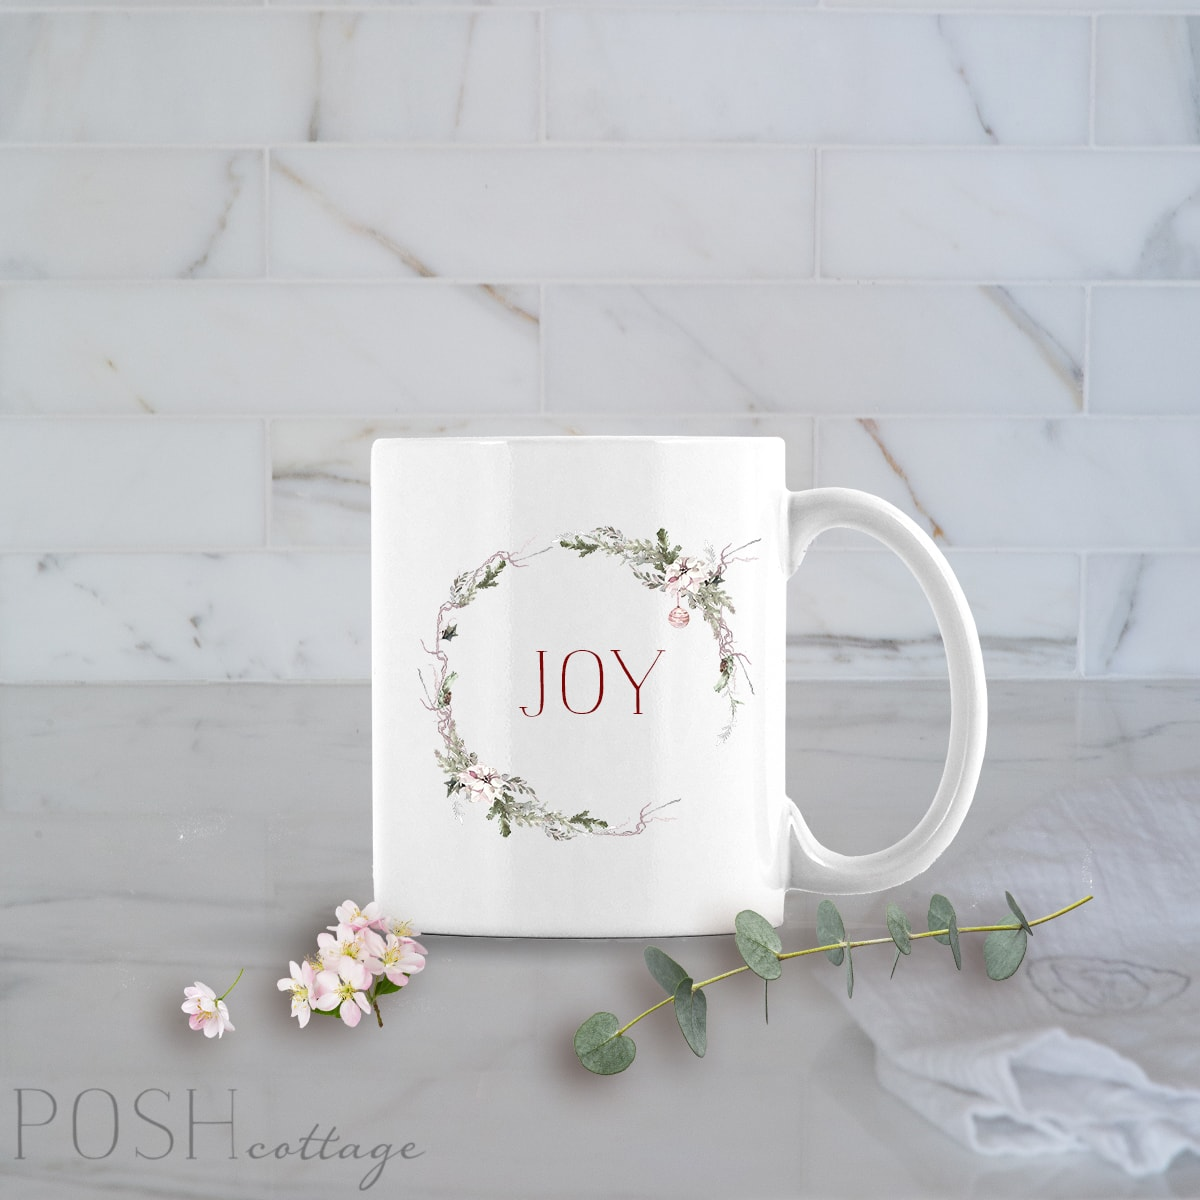 Posh Cottage Shop 11oz mug